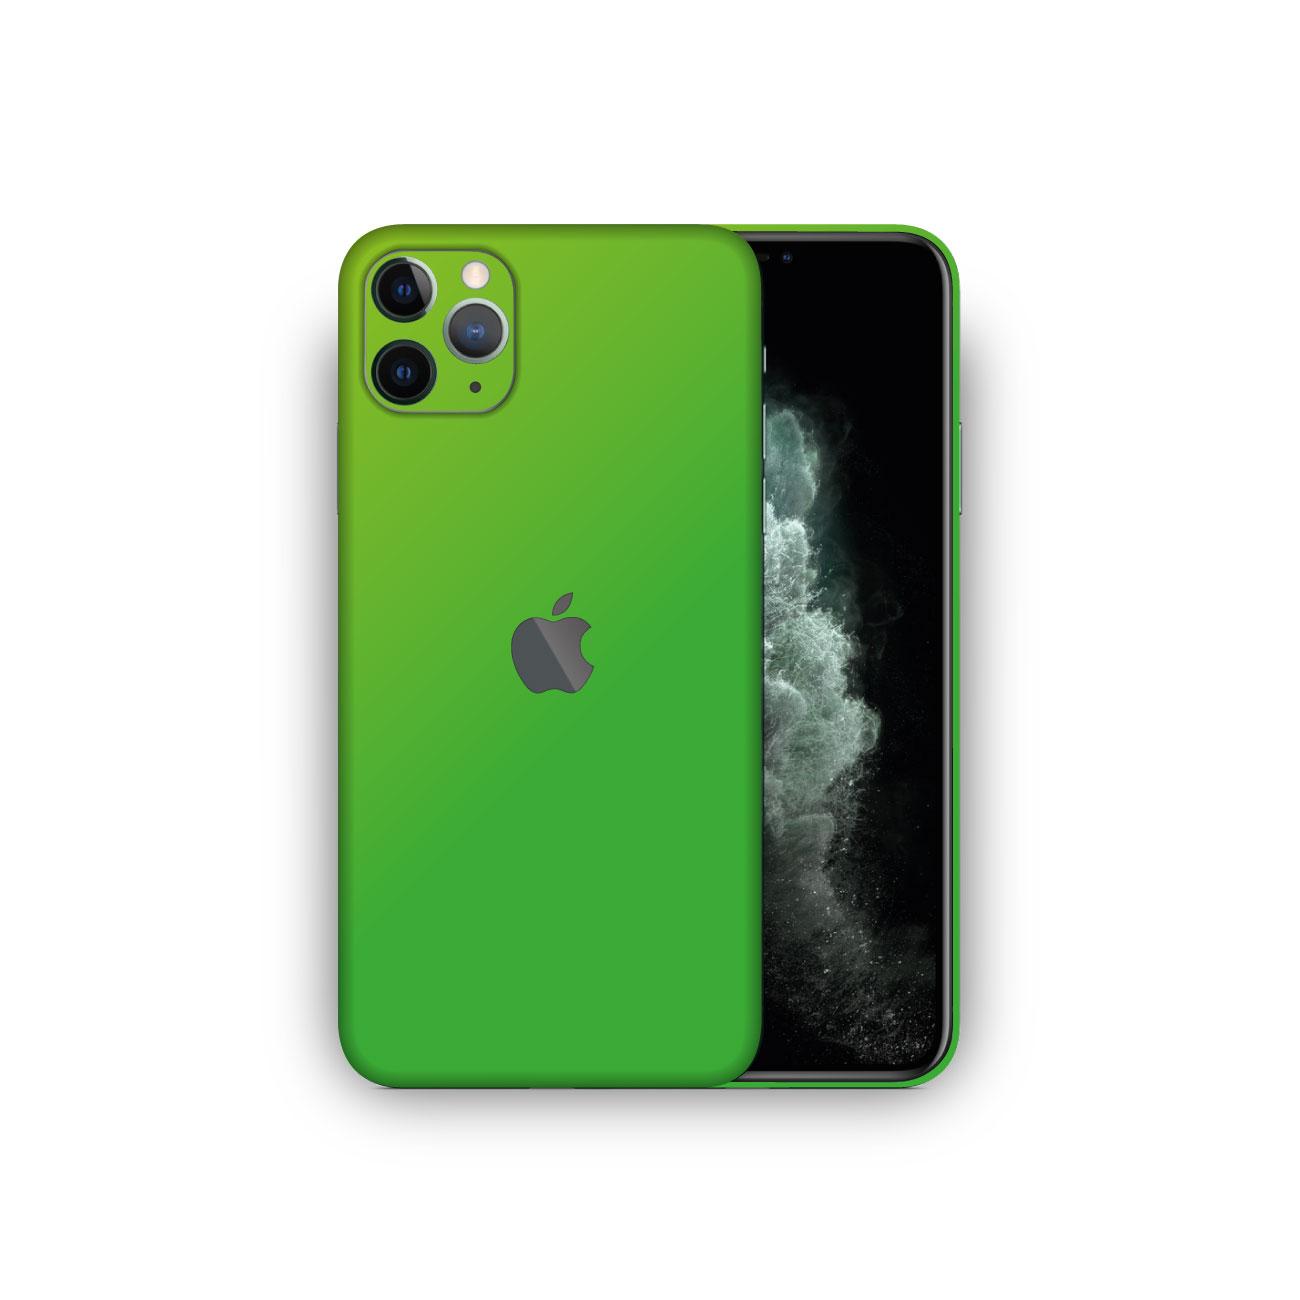 Apple iPhone 11 Pro MATTE GREEN Skin Vinyl Wrap